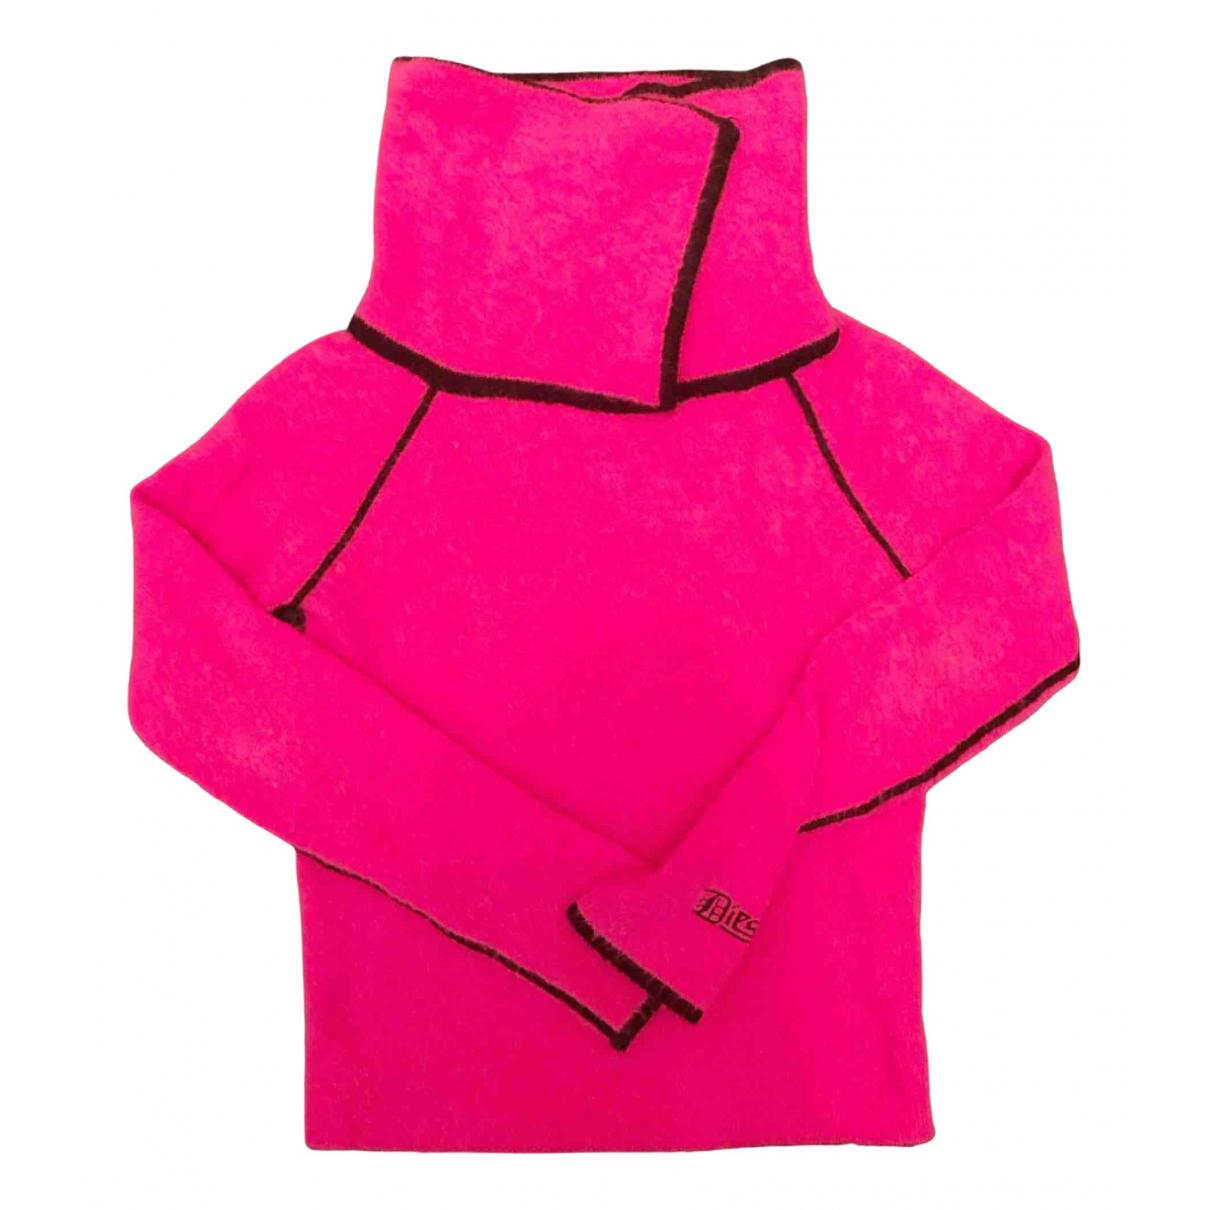 Diesel - Pull   pour femme en laine - rose